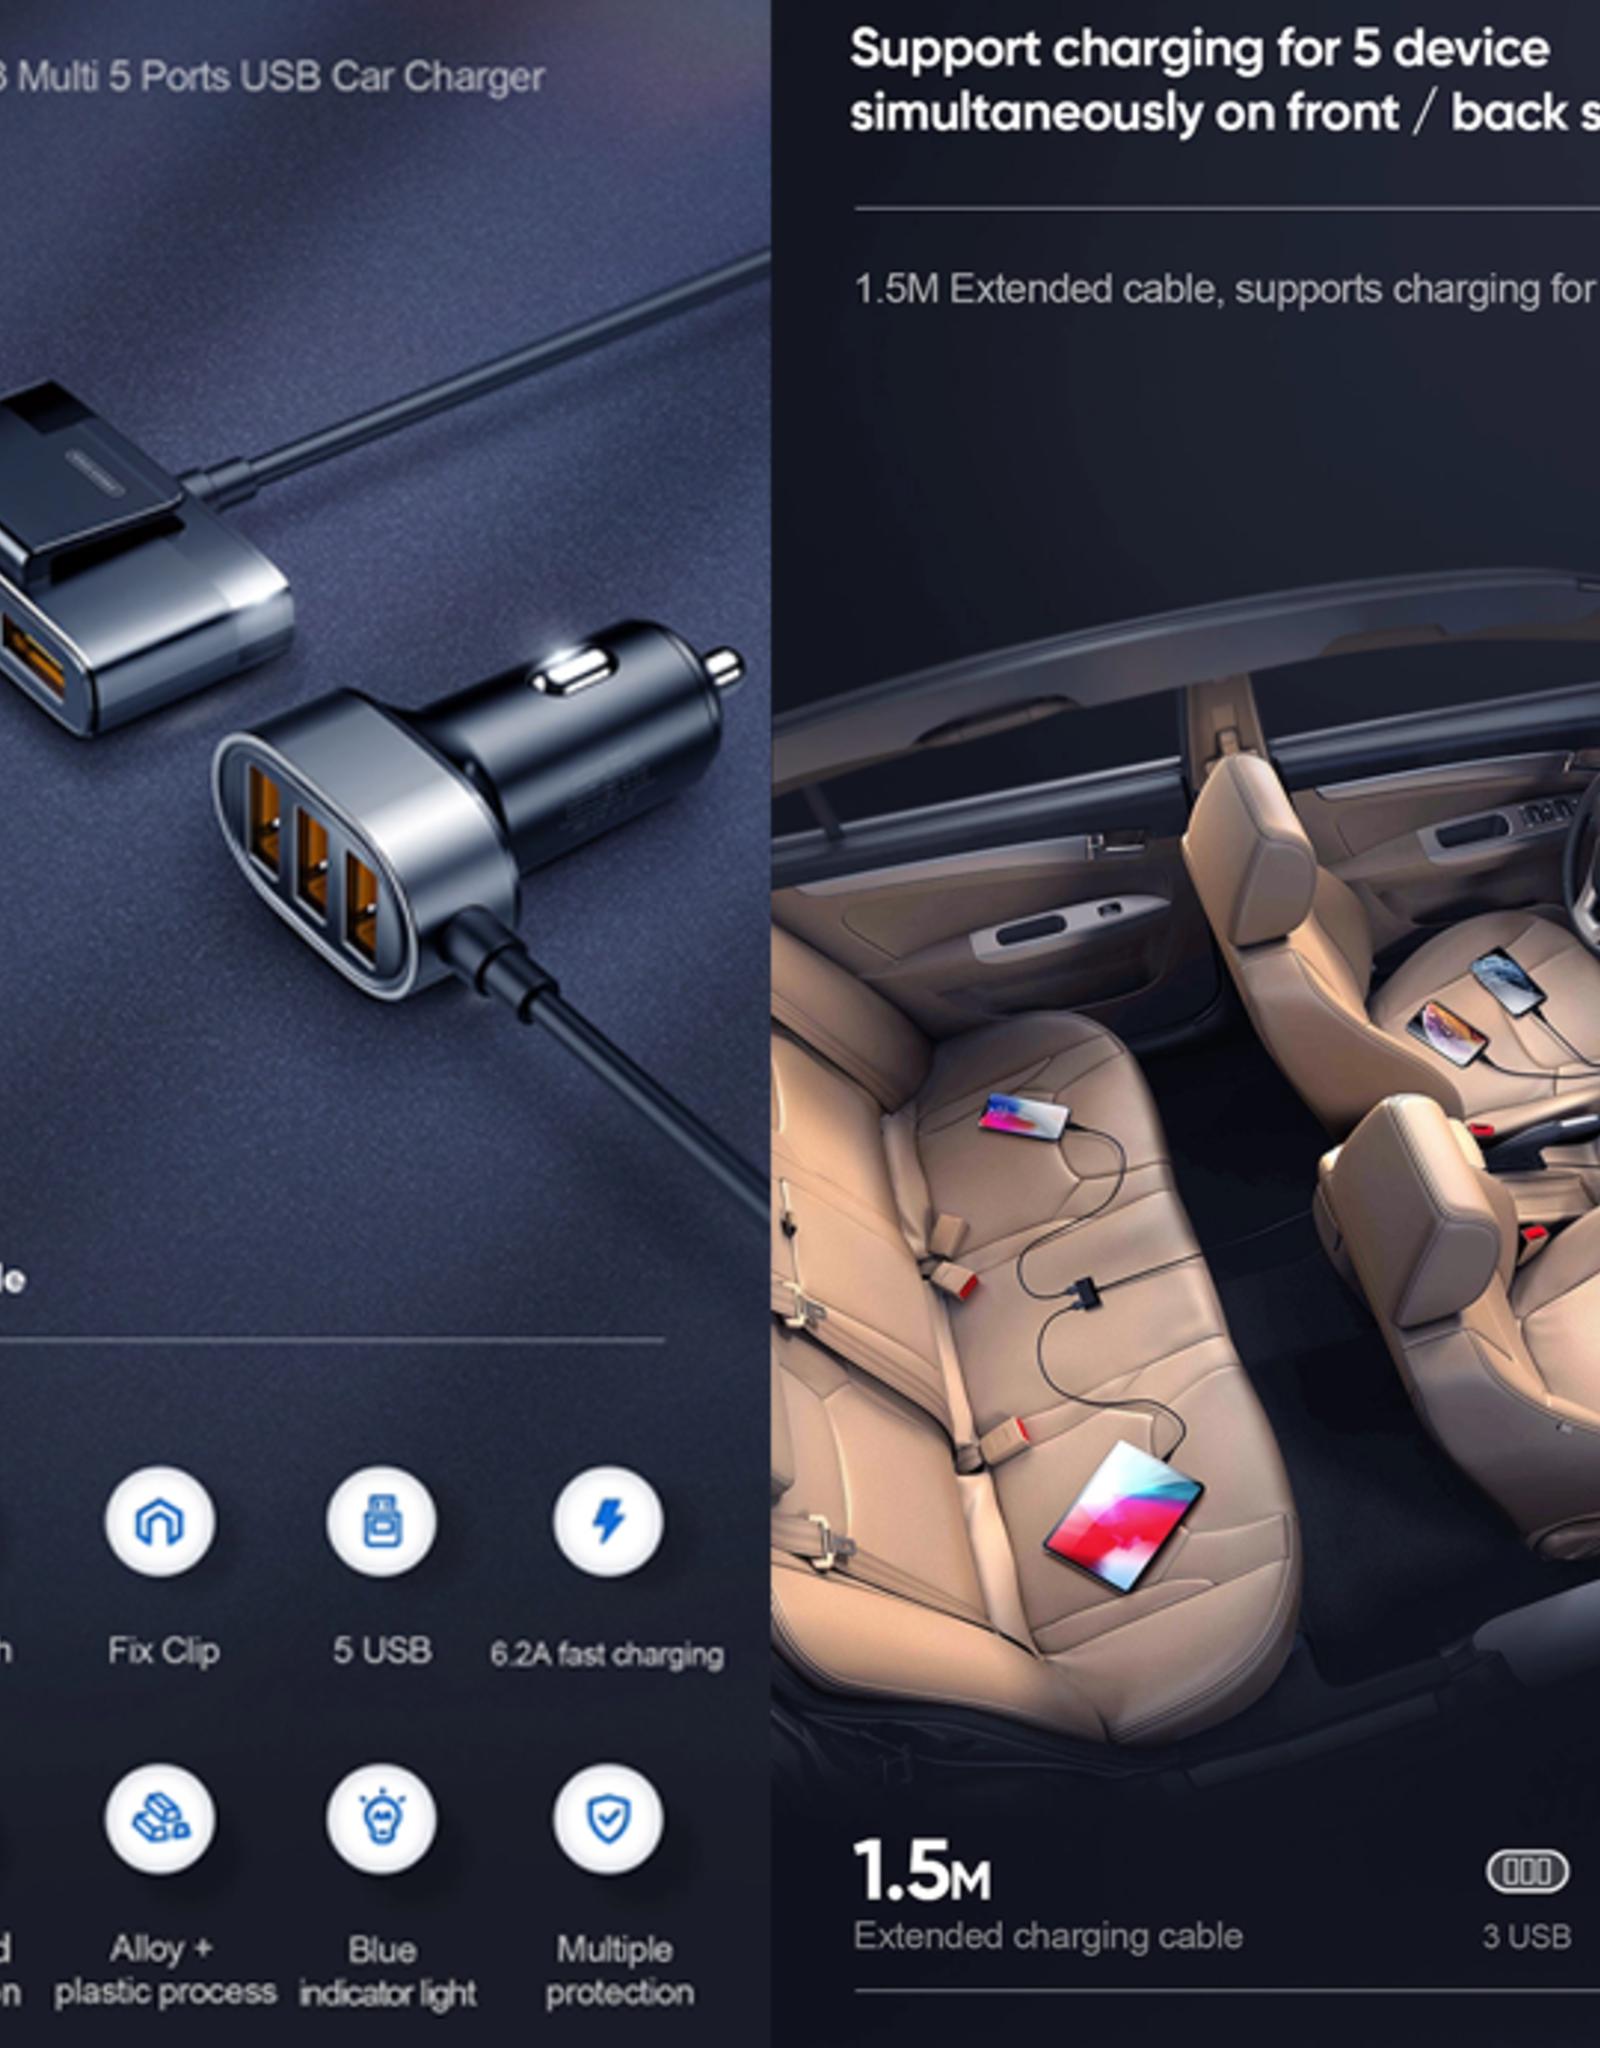 Joyroom Joyroom  JR-CL03 Multi 5 Ports ( 3 + 2 ) USB Car Charger